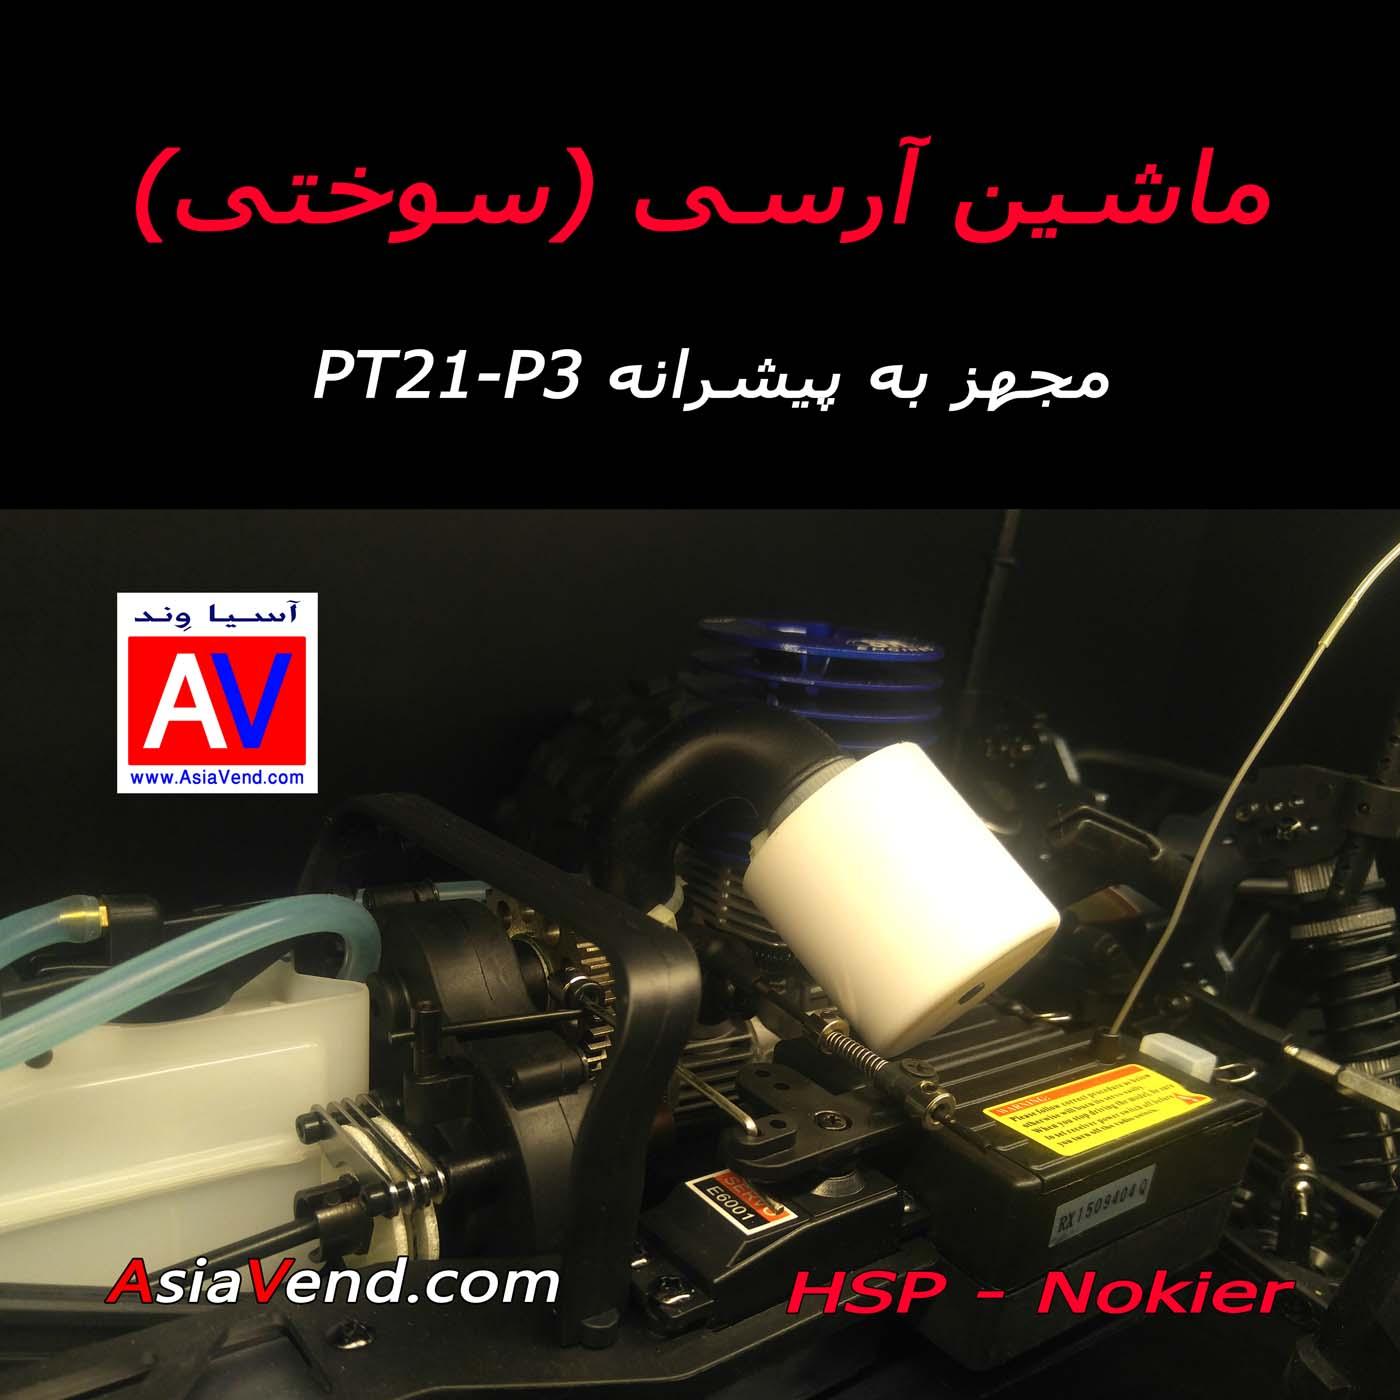 HSP NOKIER PRICE خرید ماشین آرسی سوختی / HSP NITRO RC CAR